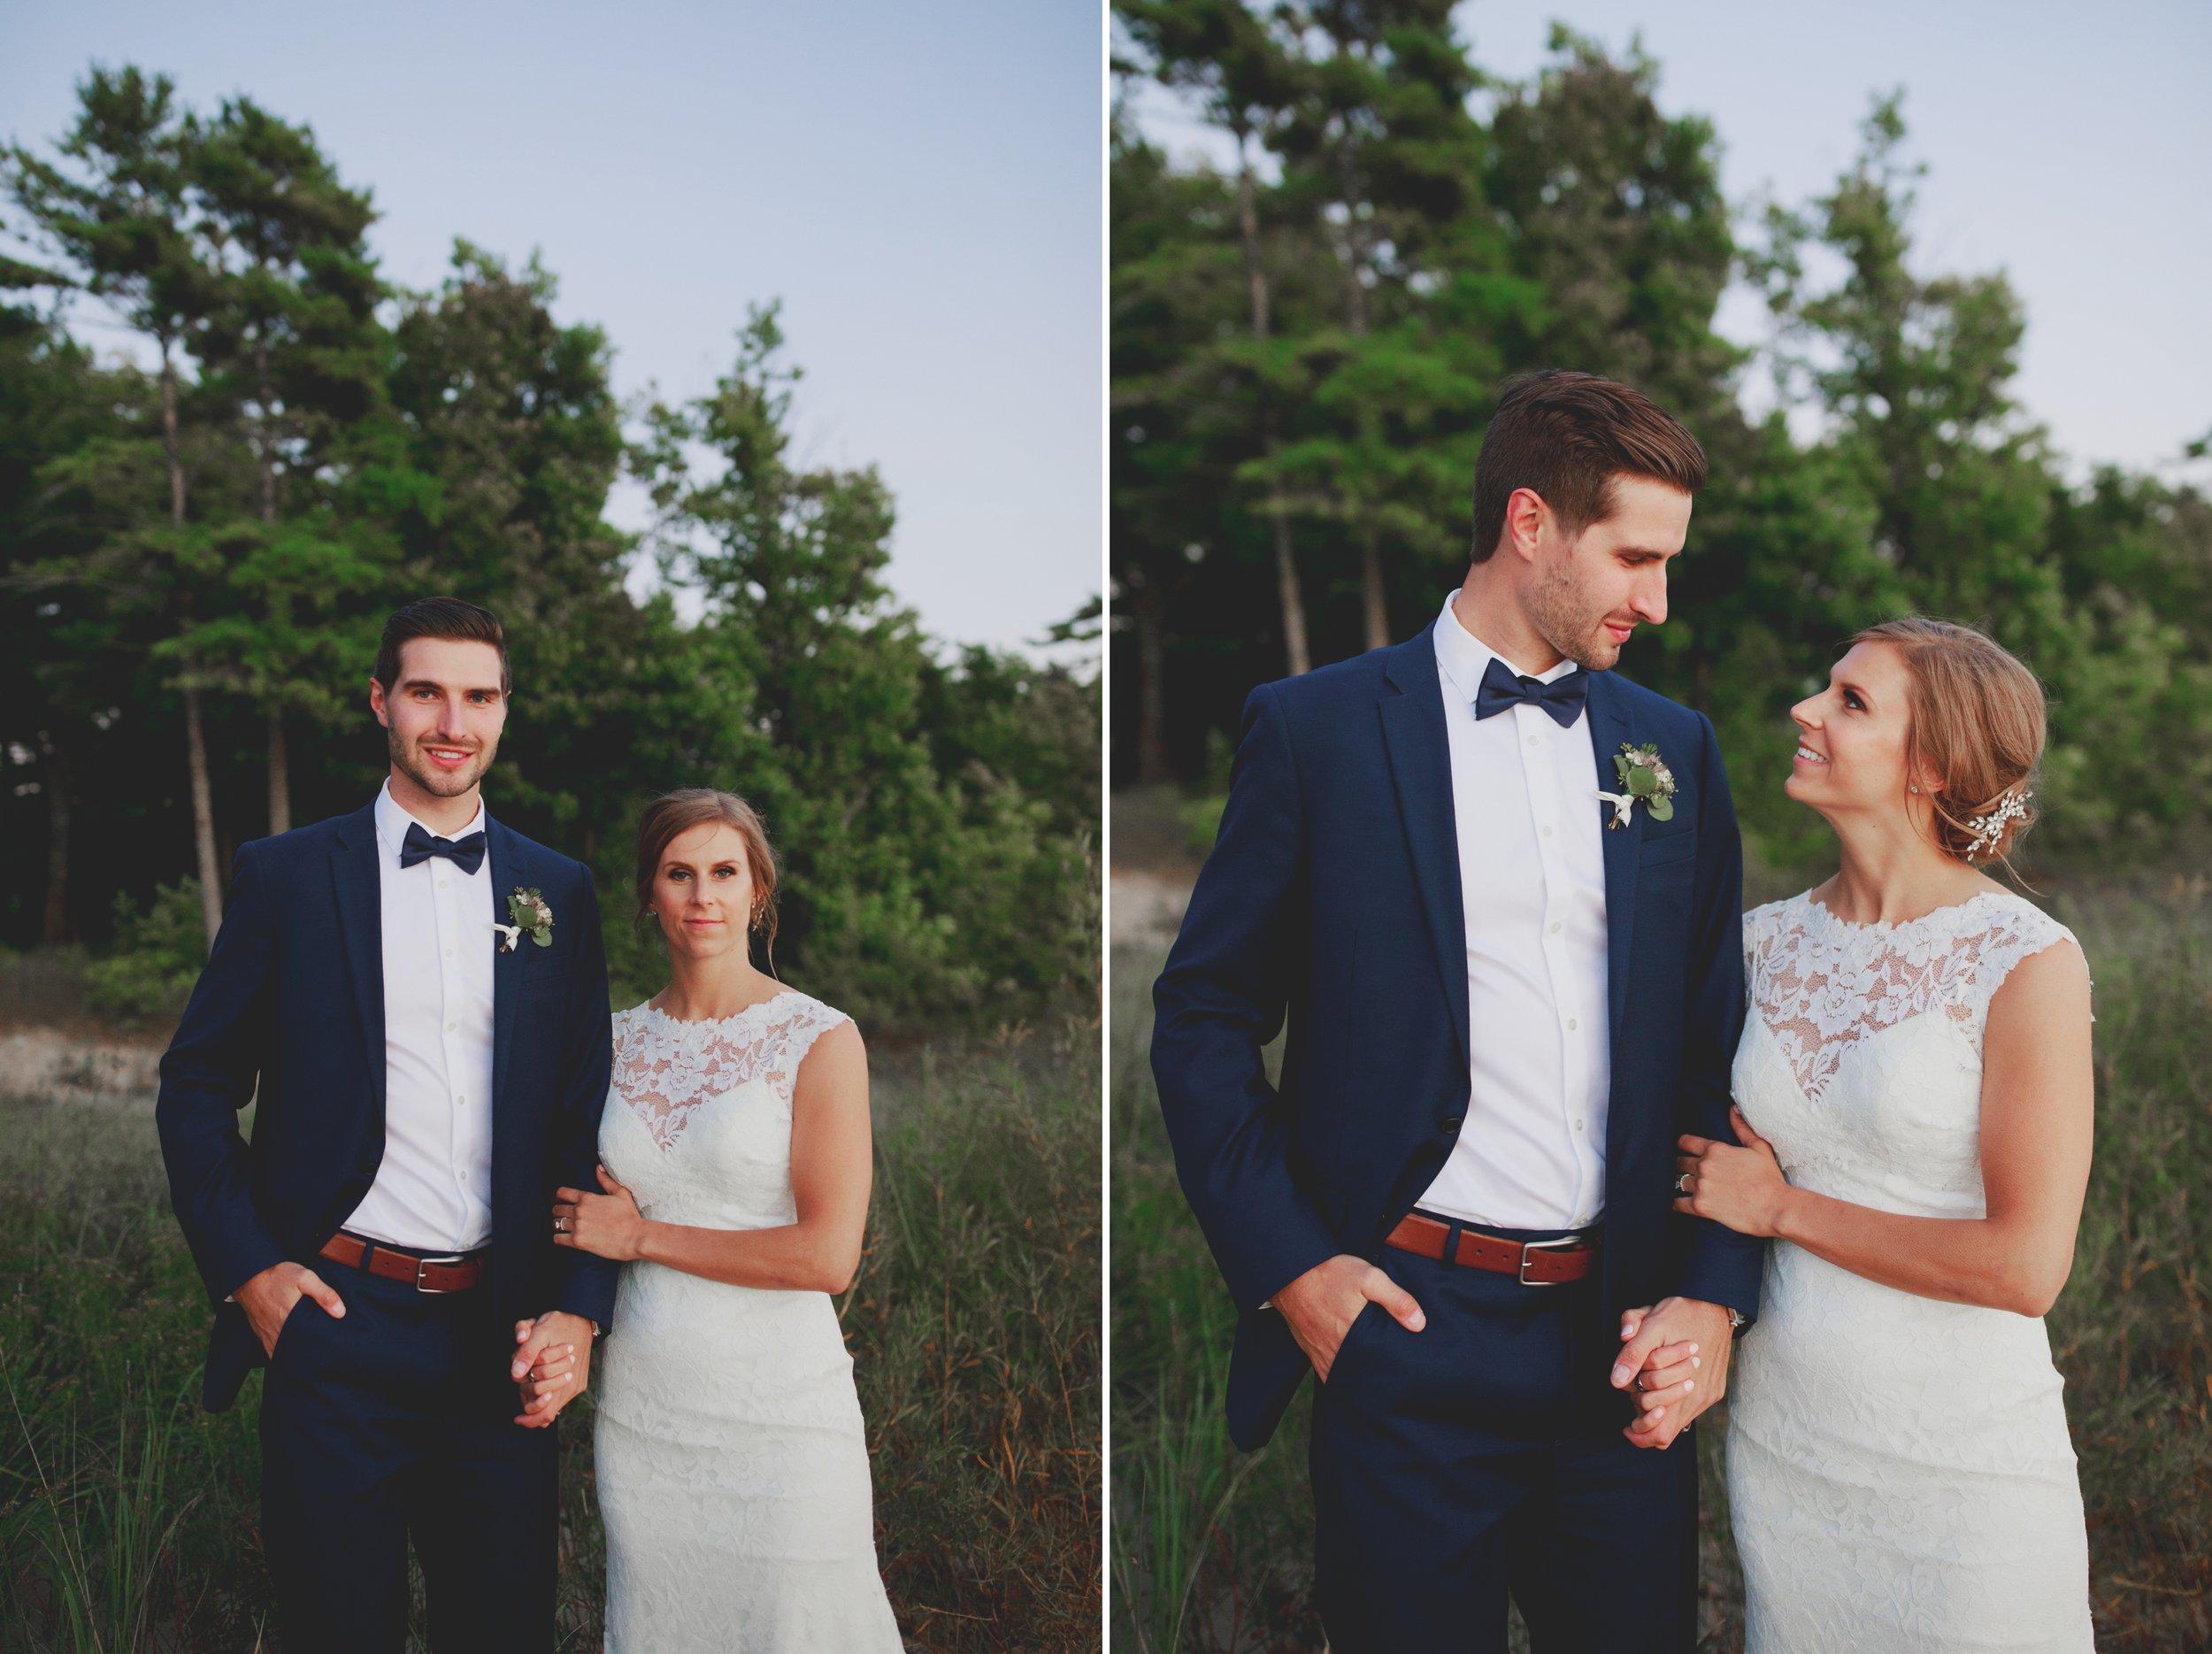 traverse_city_wedding_142.jpg